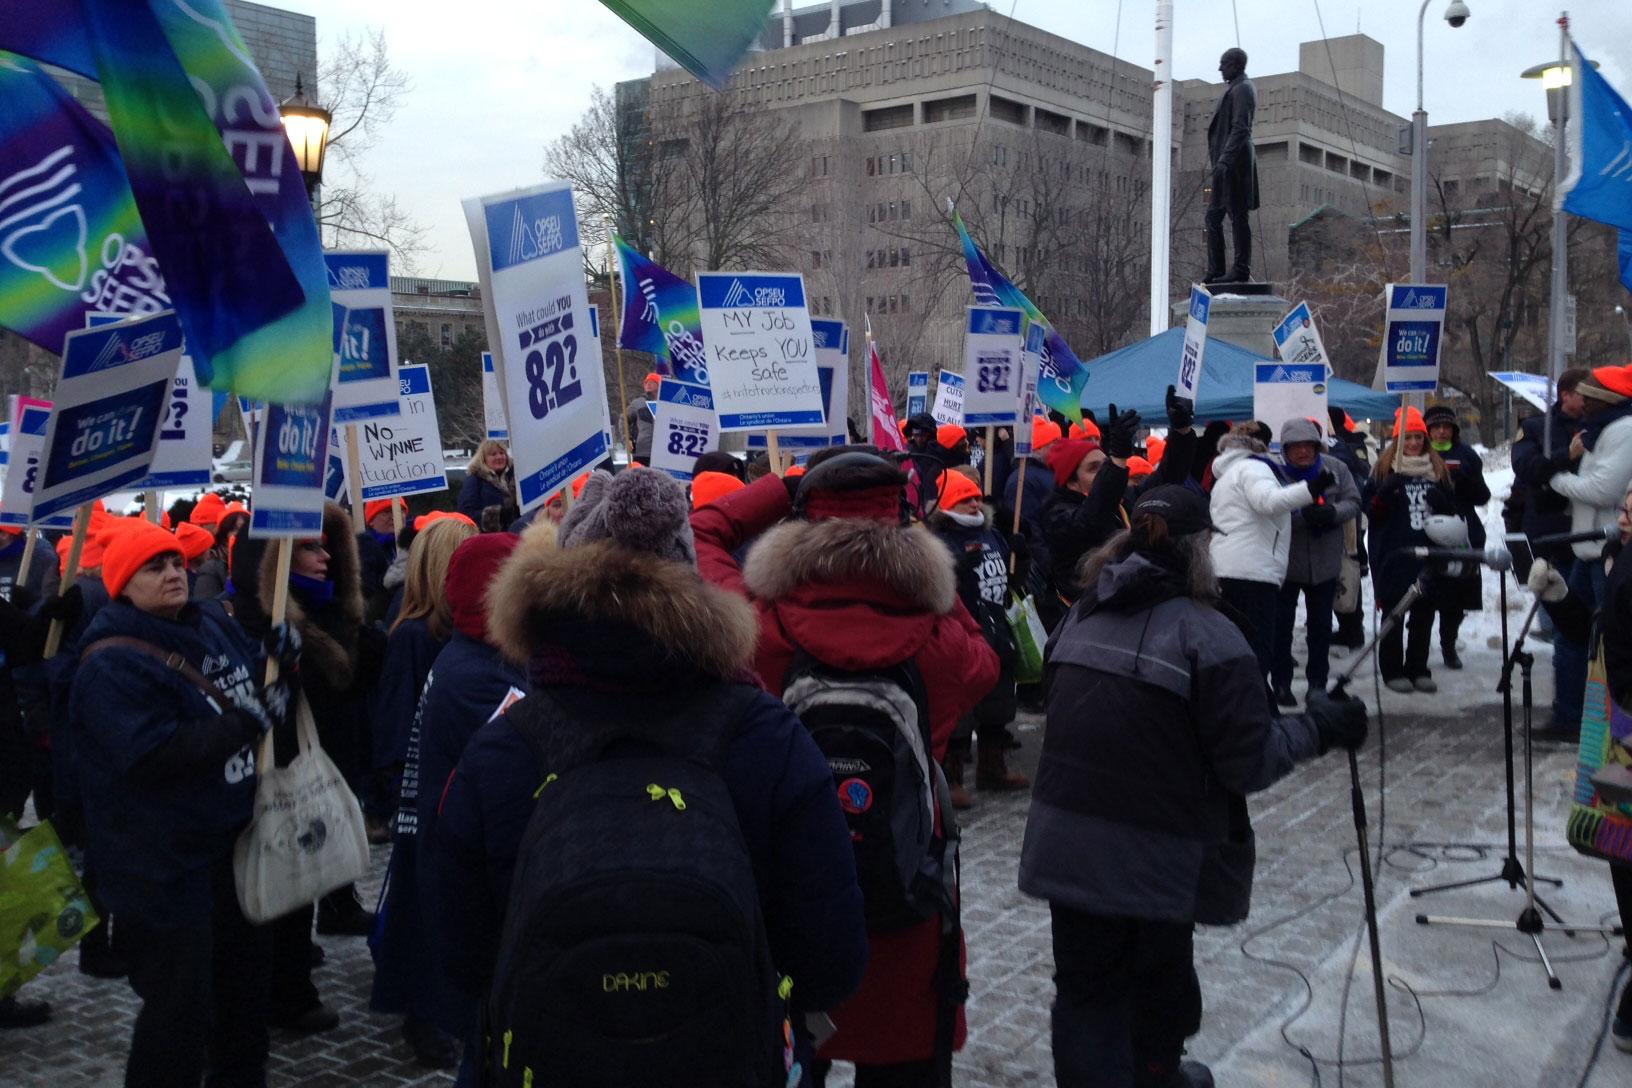 Ontario's public service workers rally at Queen's Park on Feb. 17, 2015. CITYNEWS/Bert Dandy